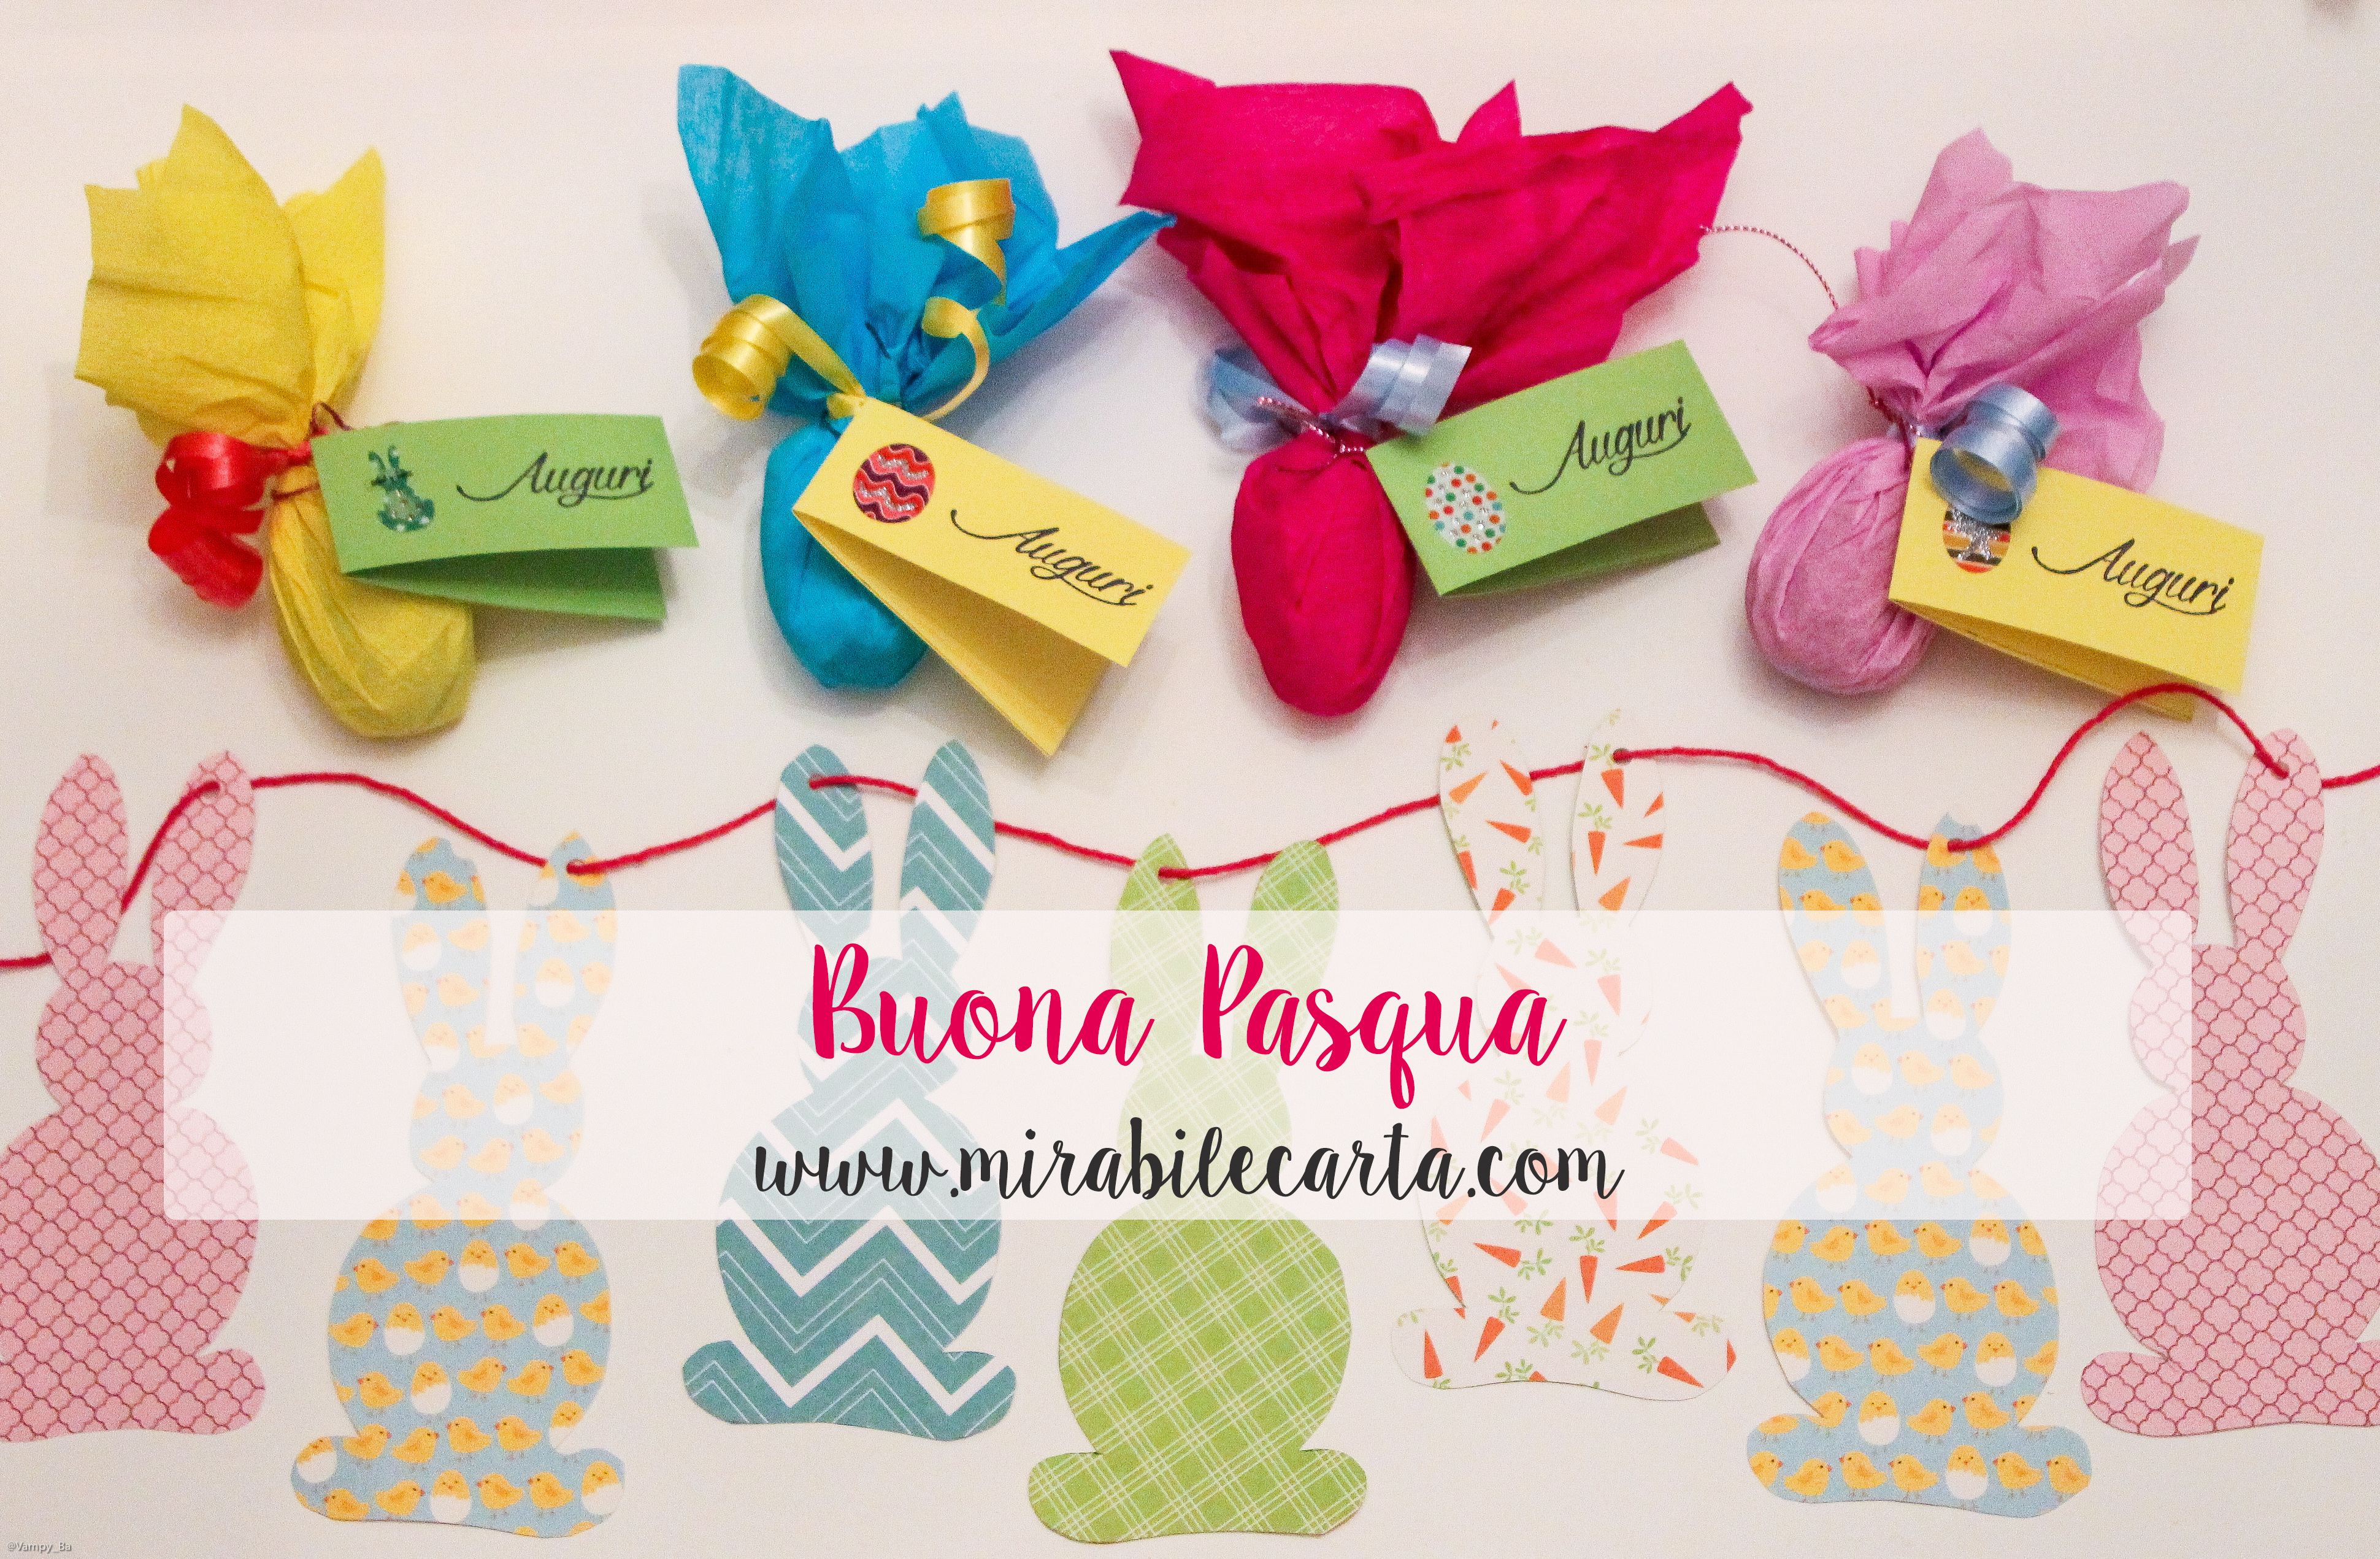 Pasqua_Mirabilecarta17.jpg